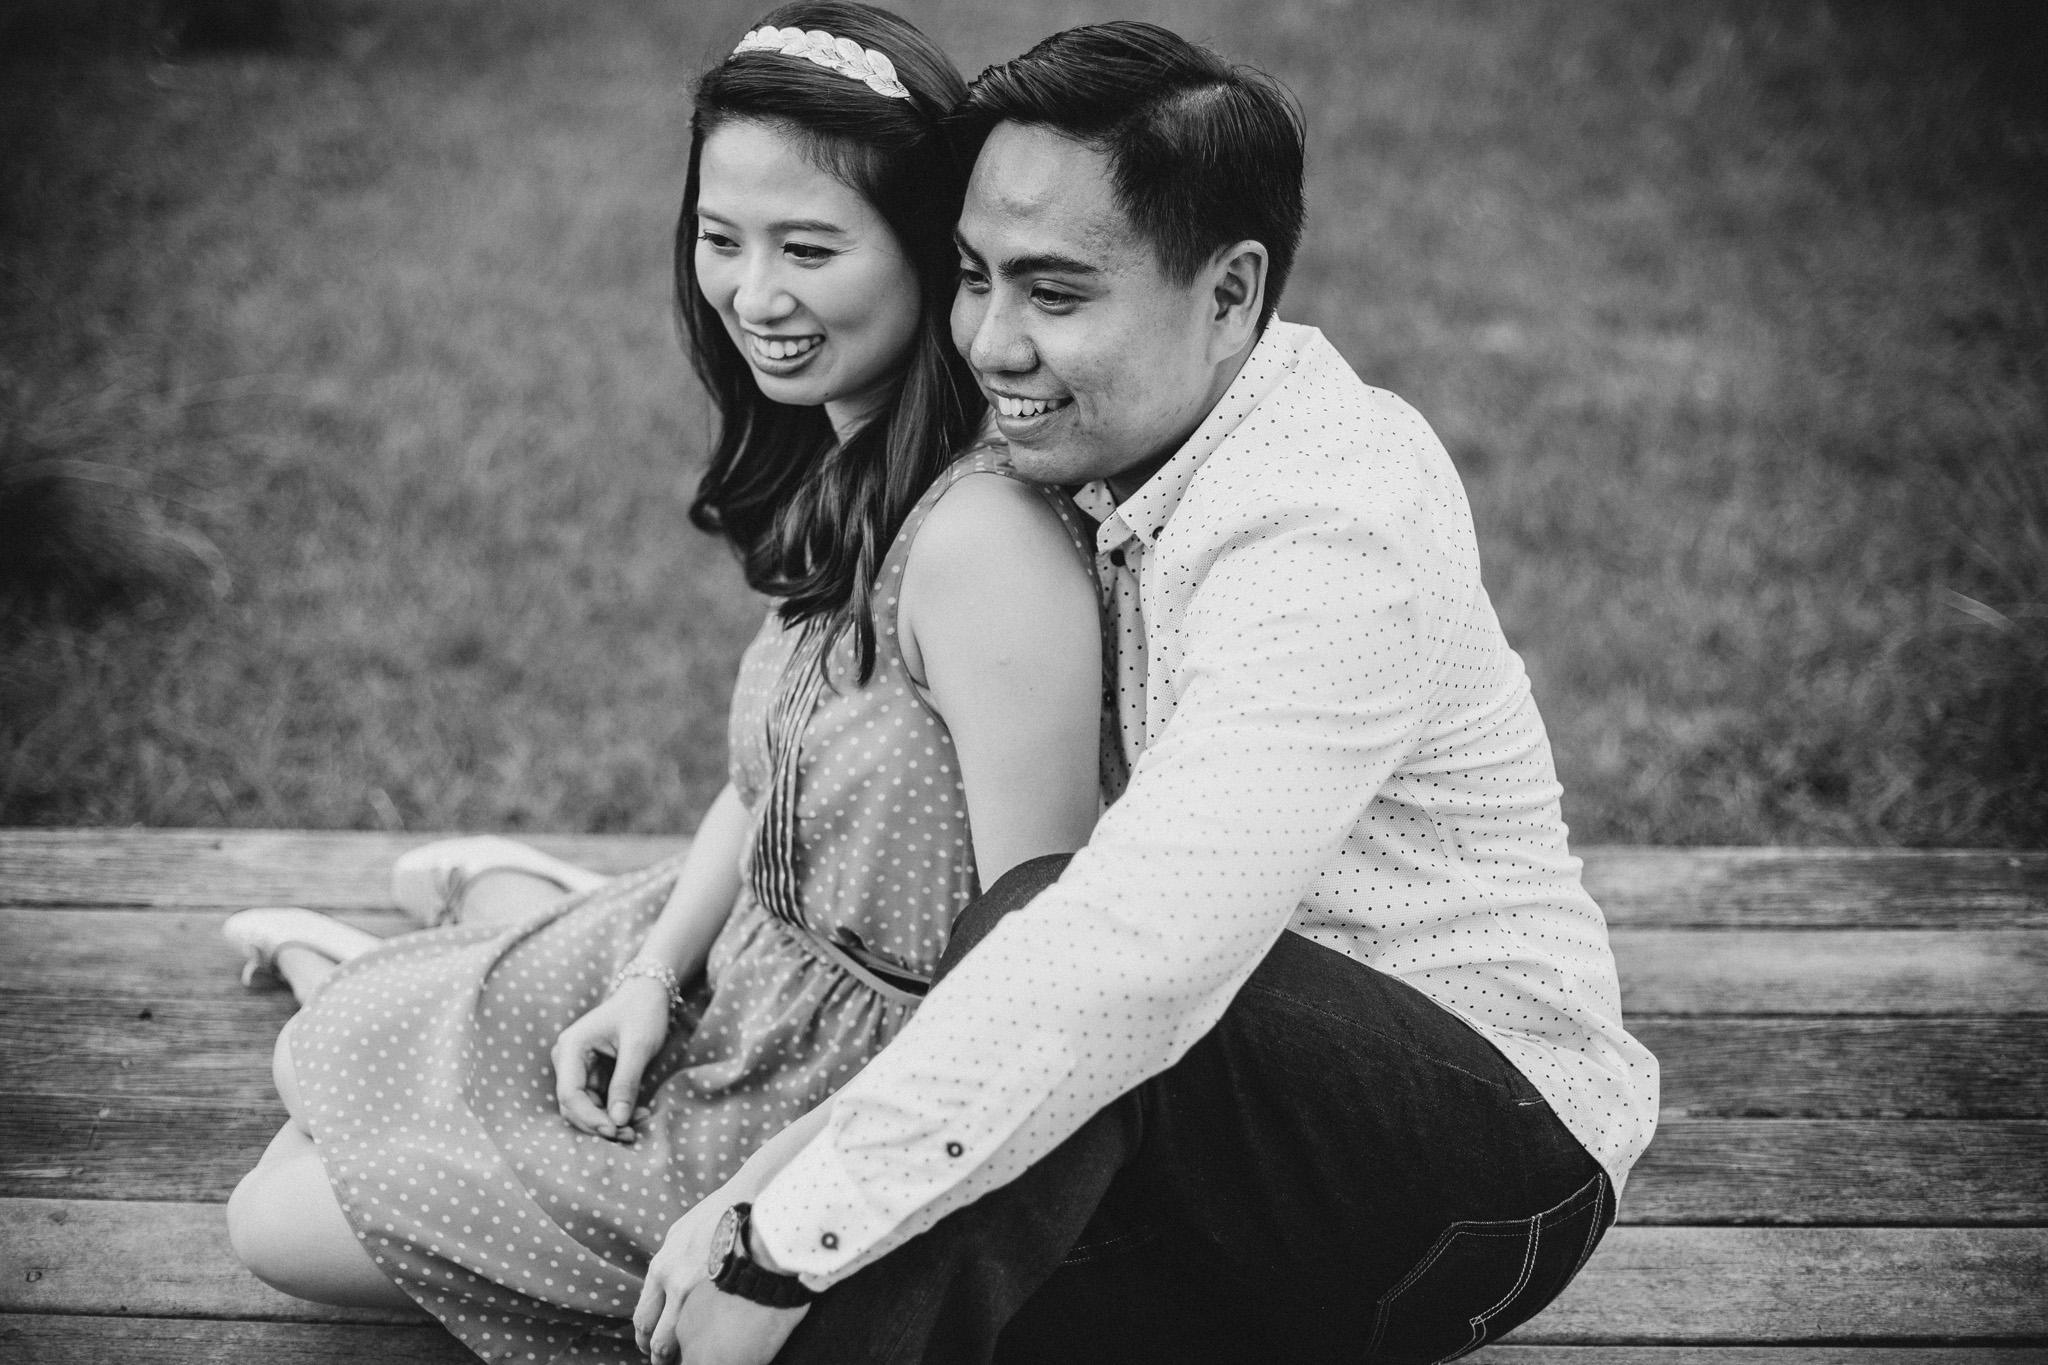 singapore--wedding-photographer-commercial-editorial-travel-wemadethese-firdaus-sasha-sessions-14.jpg